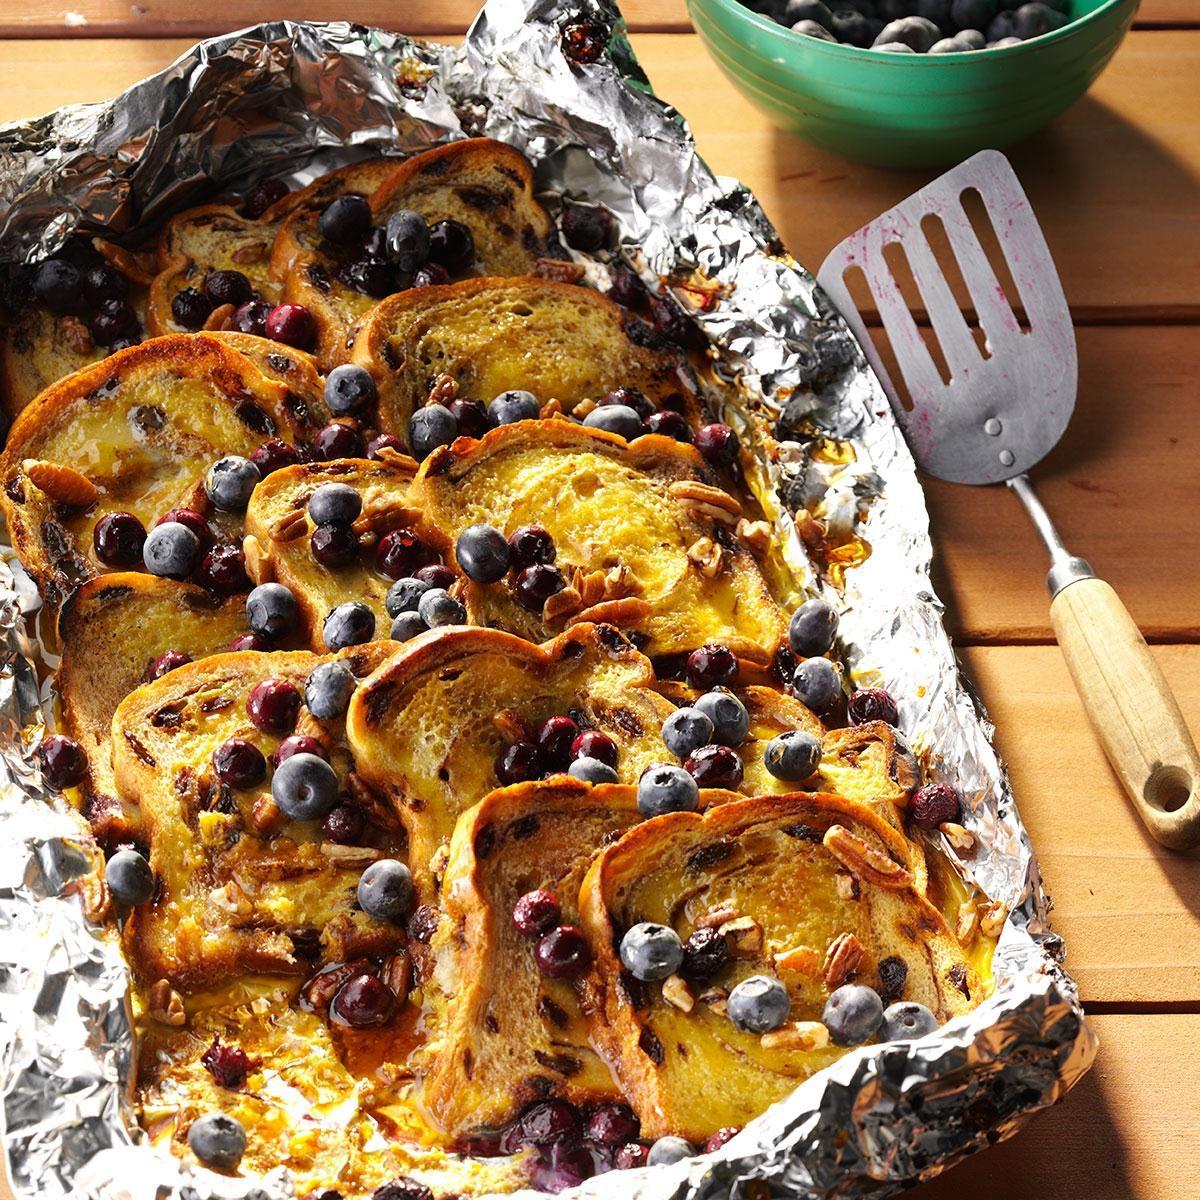 100 Camping Recipes On Pinterest: Blueberry-Cinnamon Campfire Bread Recipe